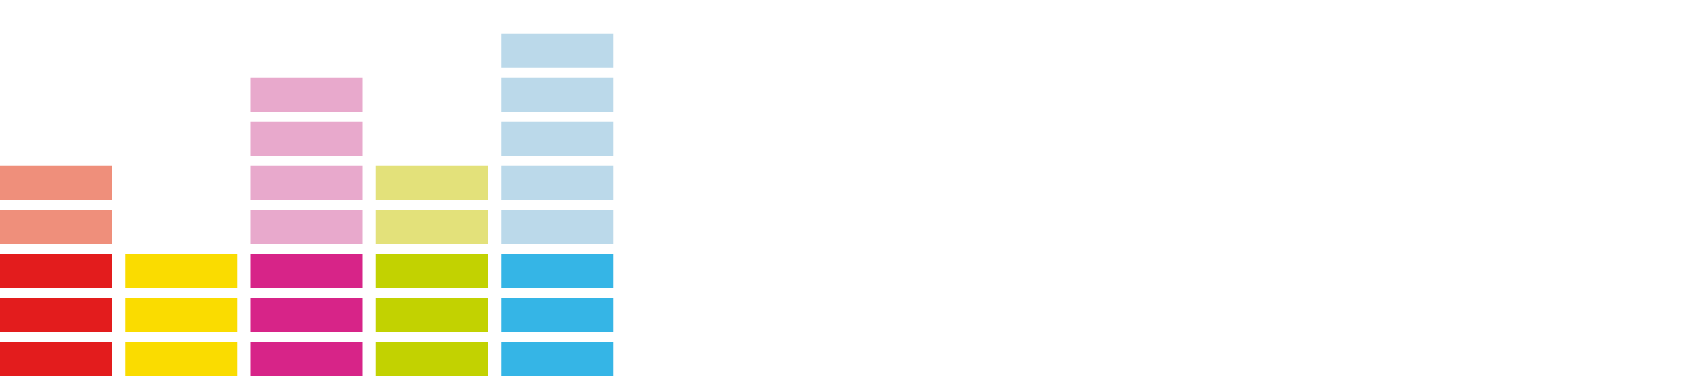 Offre Deezer